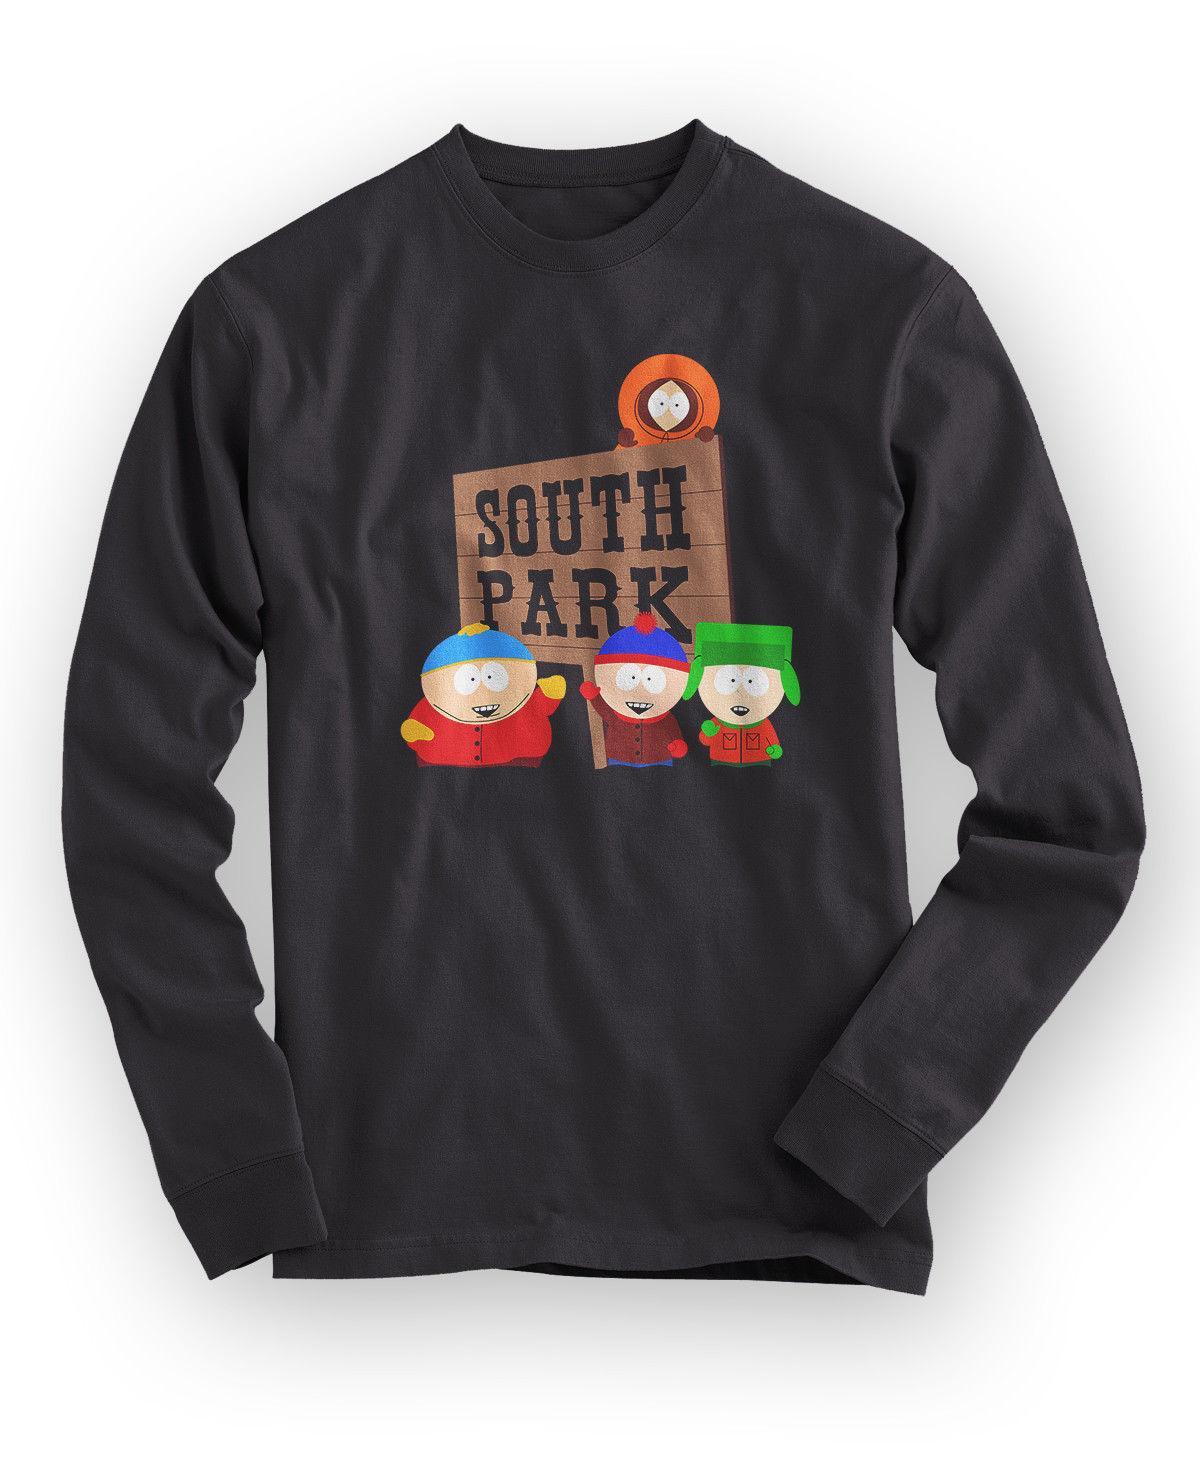 ee351b9b923 SOUTH PARK GROUP Funny Cartoon TV Series Long Sleeve Men S Black T Shirt S  3XL T Shirts Buy Shirt T From Banwanyue3